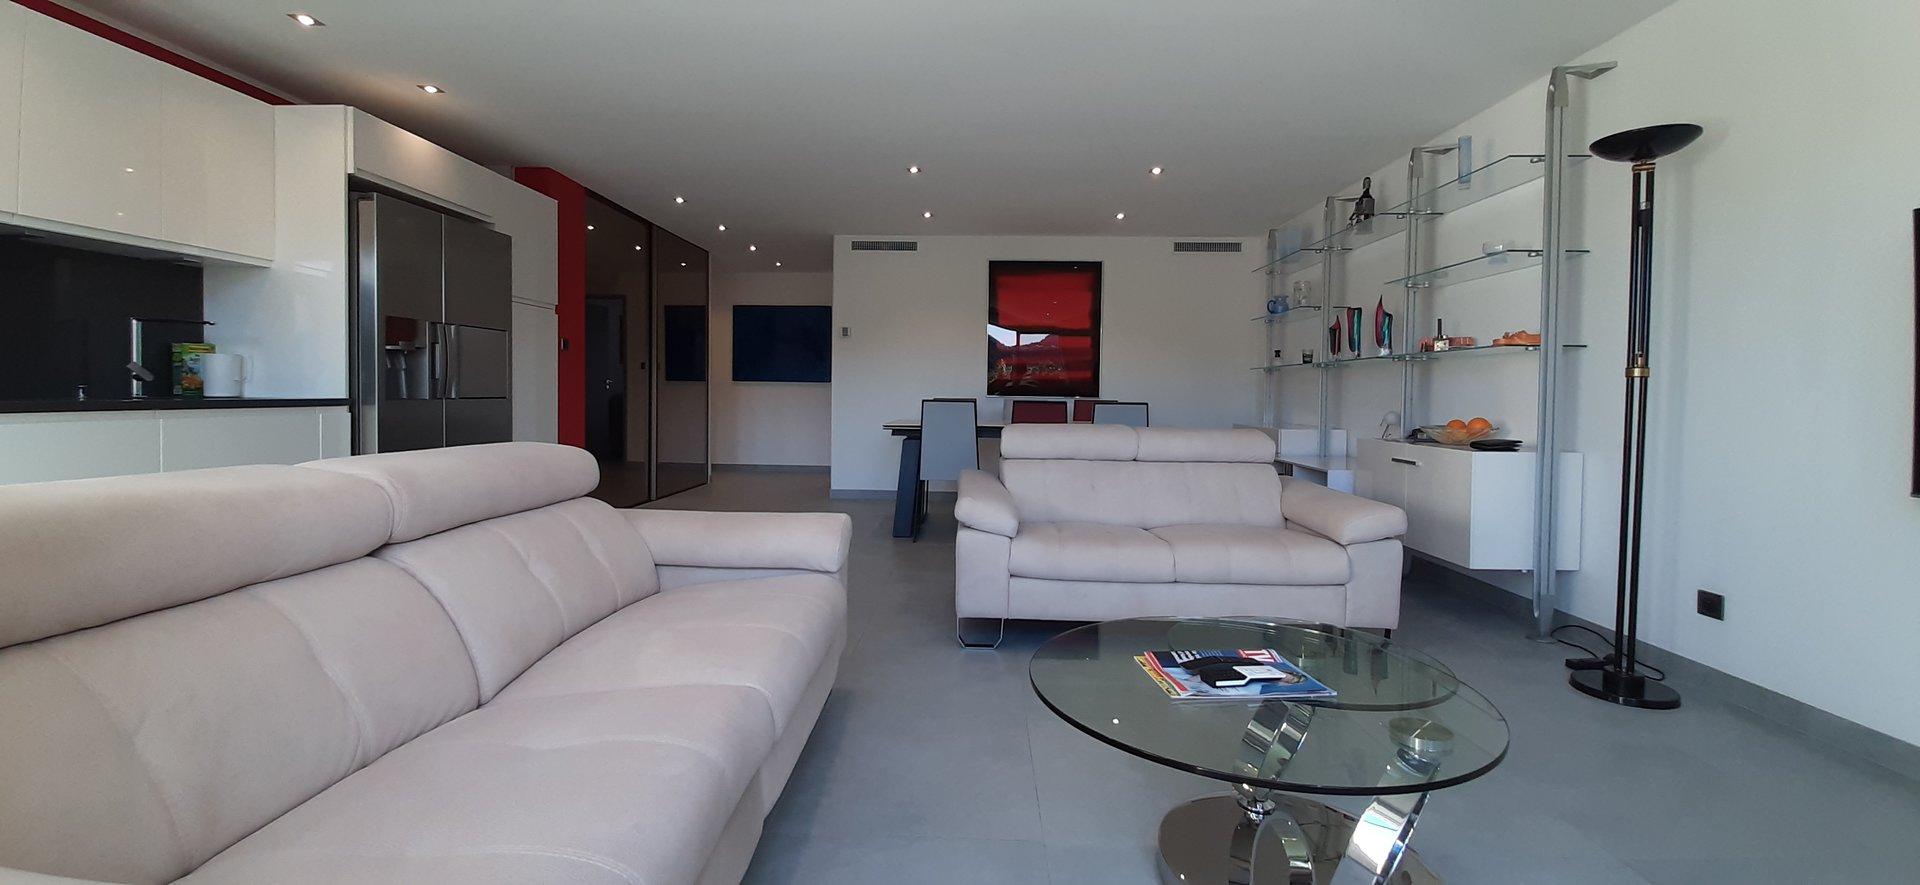 Vendita Appartamento - Mandelieu-la-Napoule Minelle